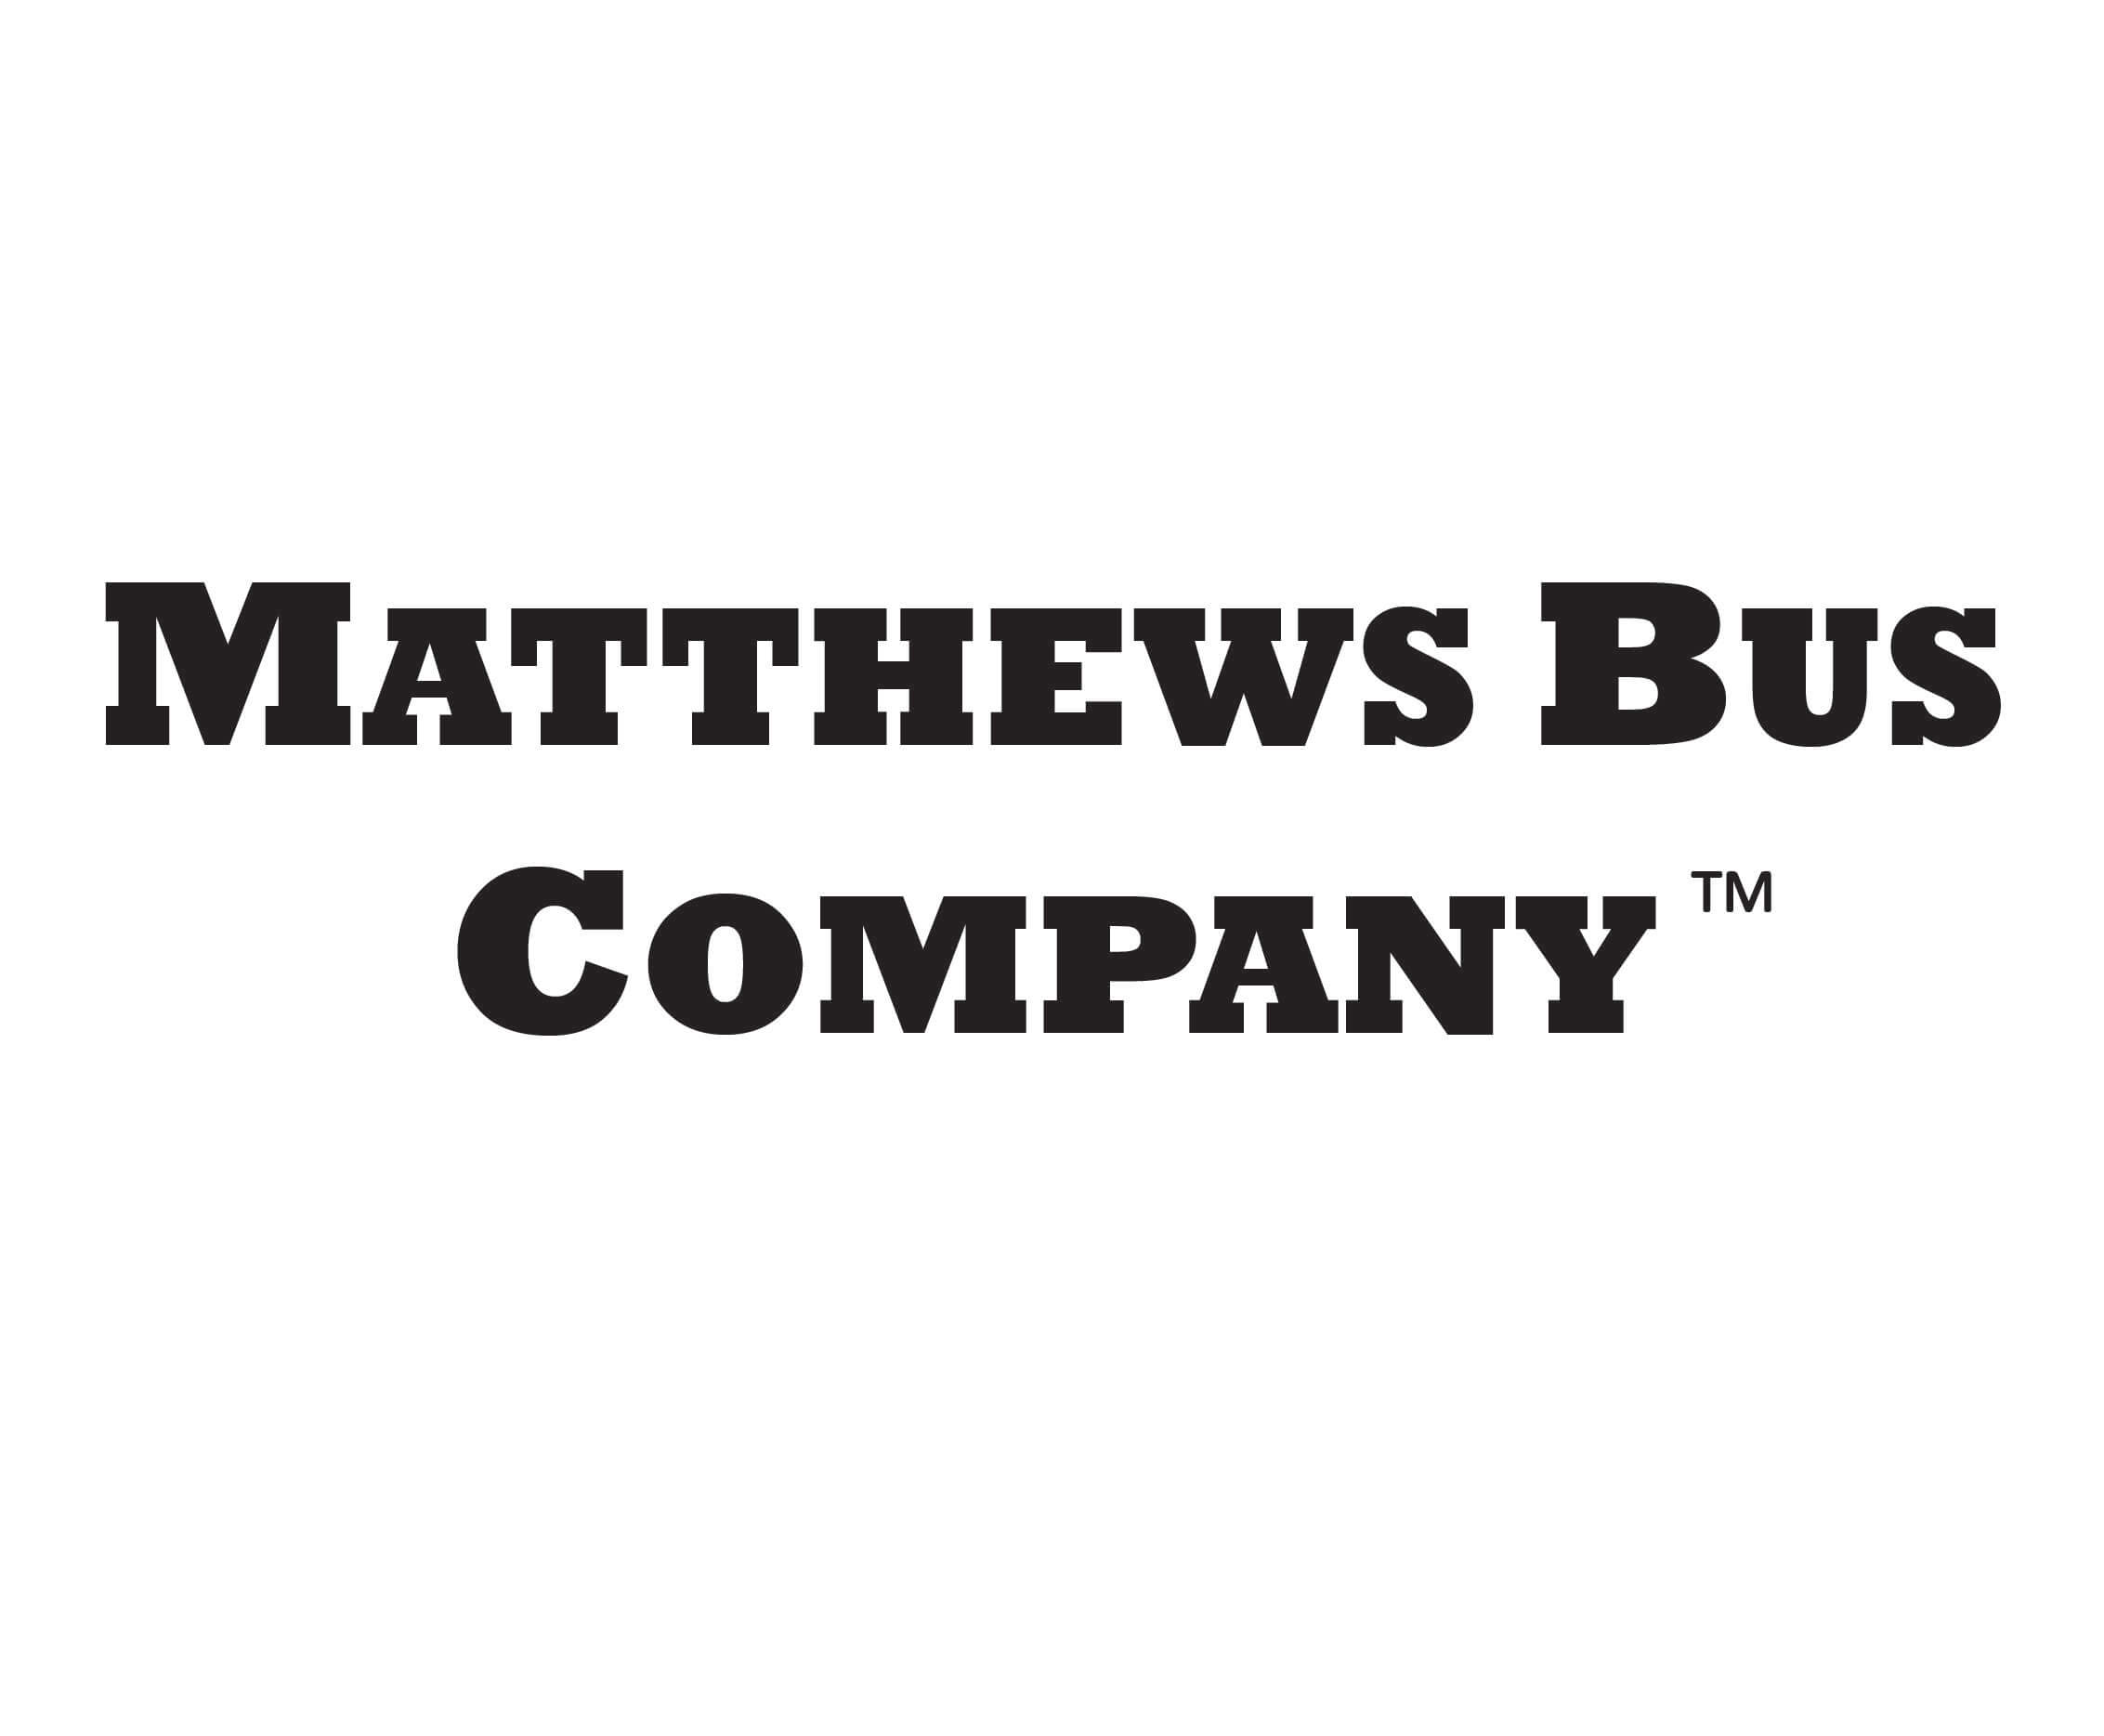 Matthews Bus Company